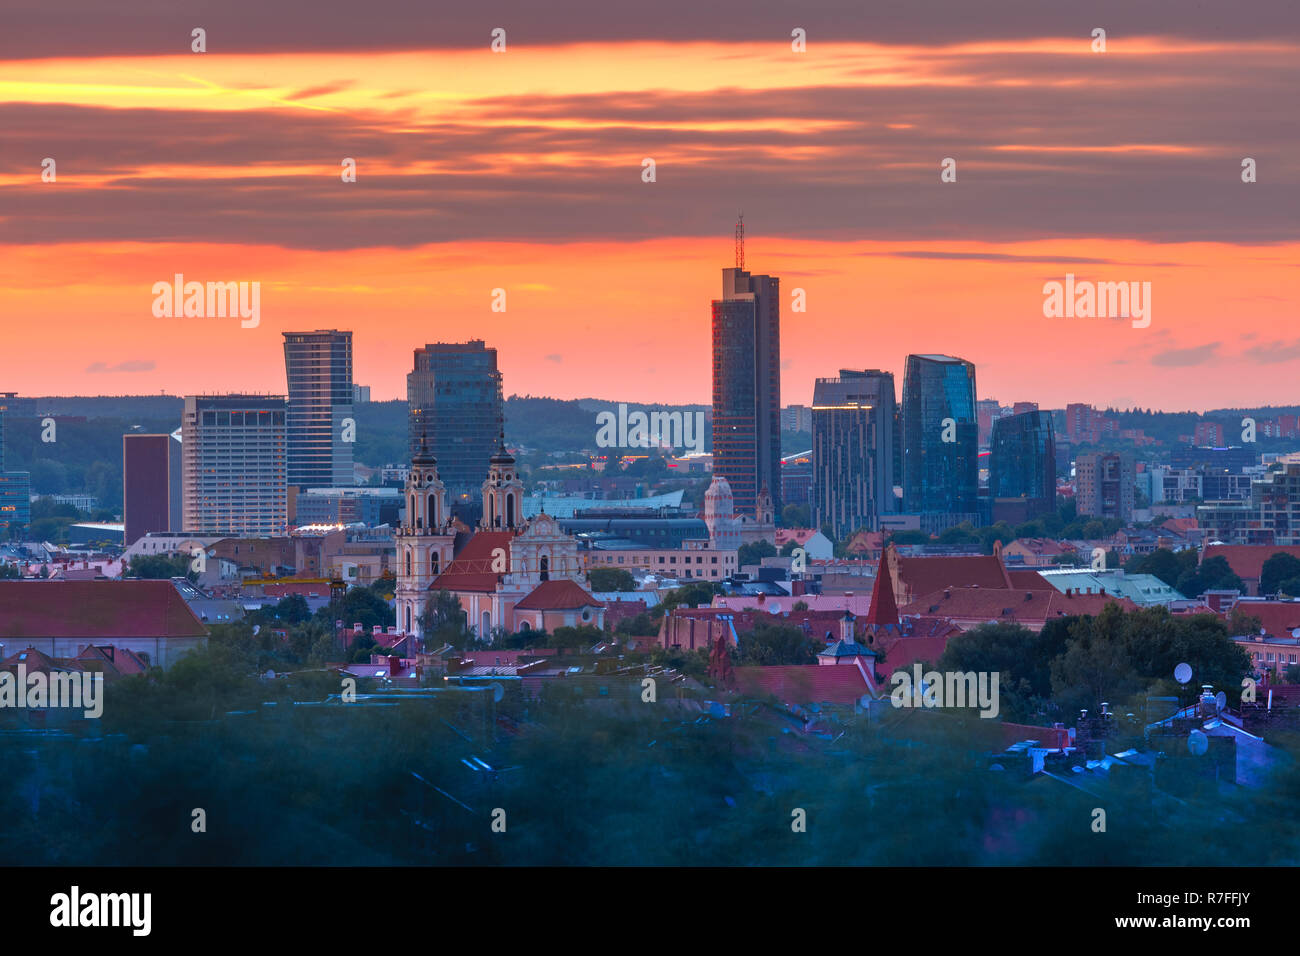 Casco antiguo y rascacielos, Vilnius, Lituania Foto de stock